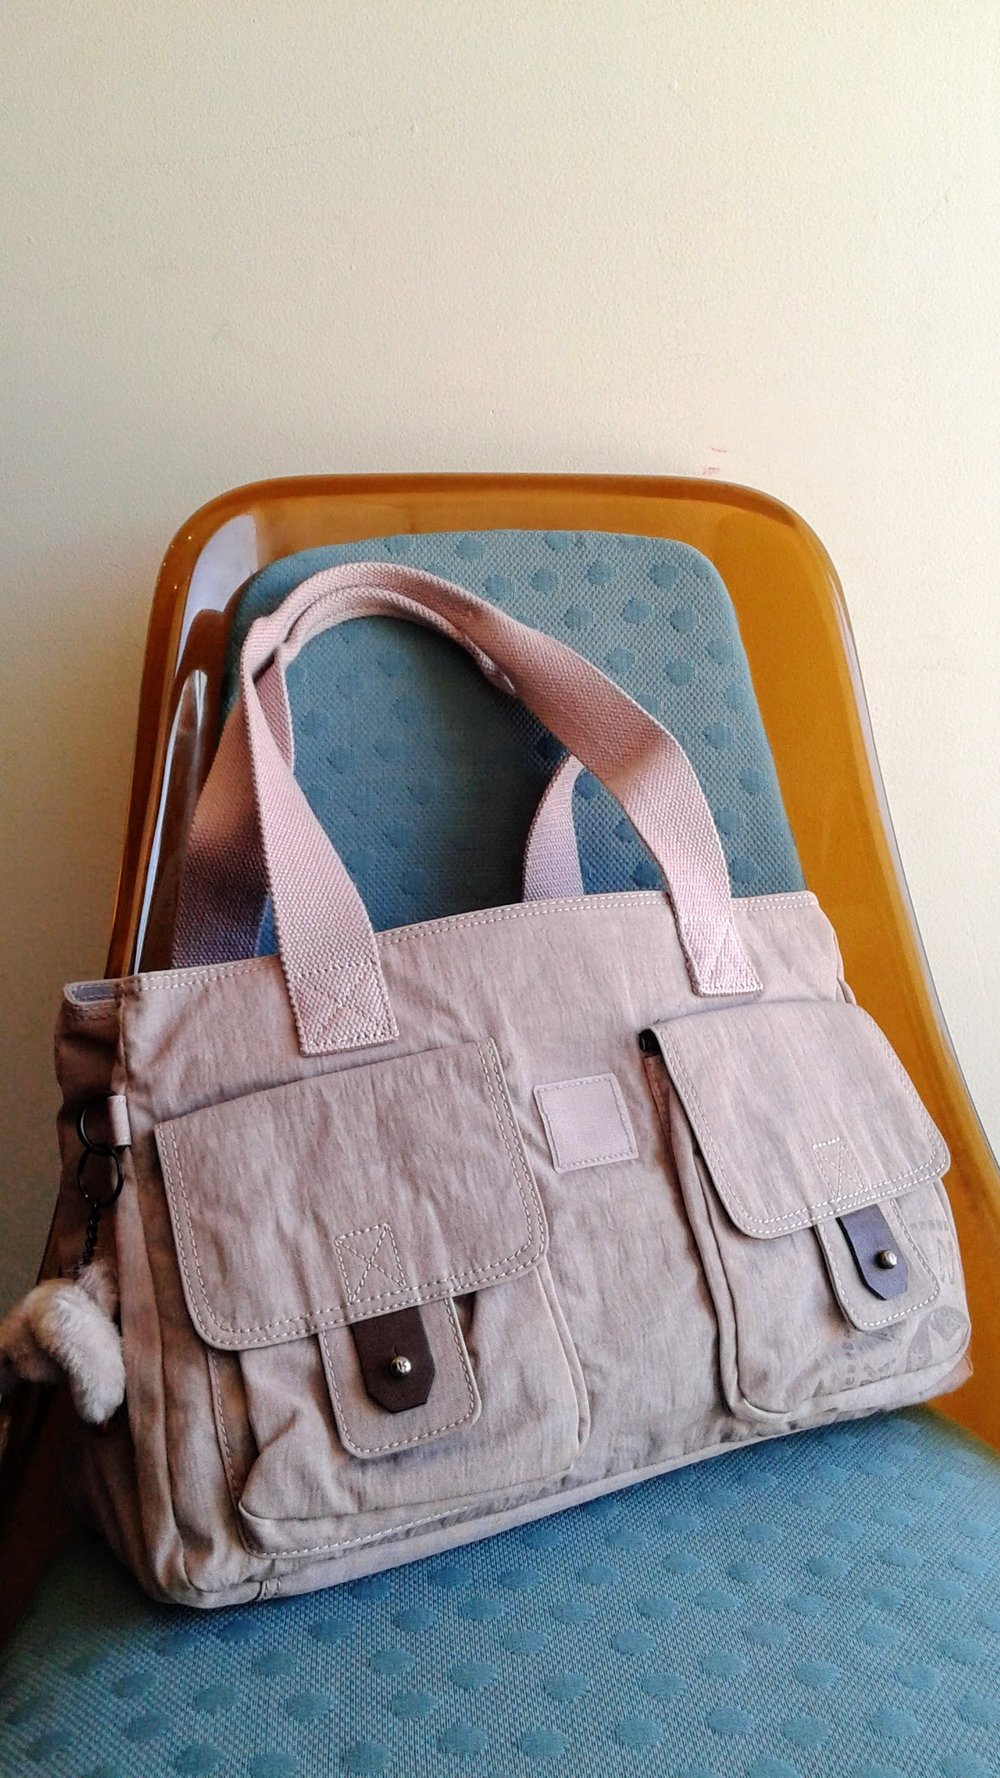 Kipling bag, $30